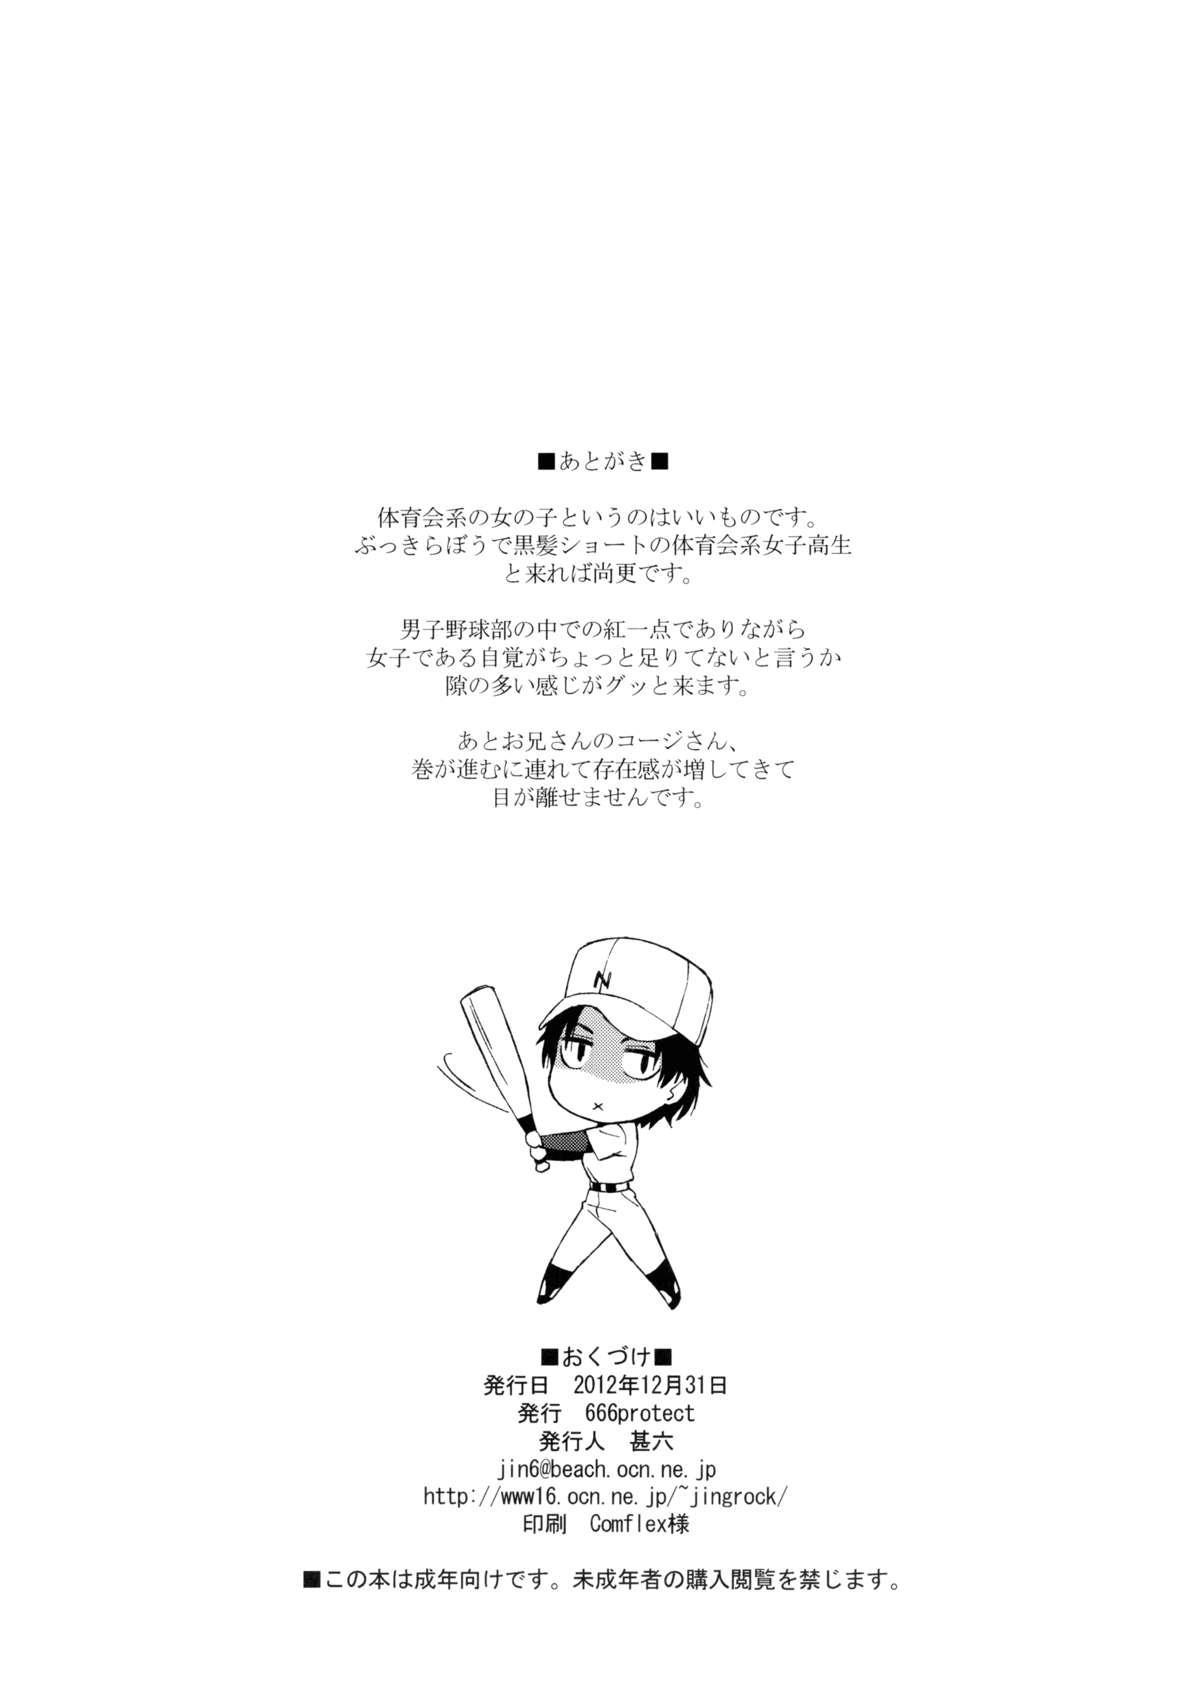 (C83) [666protect (Jingrock)] Kiretemasuyo, Hamuzawa-san. | There's Something about Hamuzawa-san (Koukou Kyuuji Zawa-san) [English] =LWB= 14